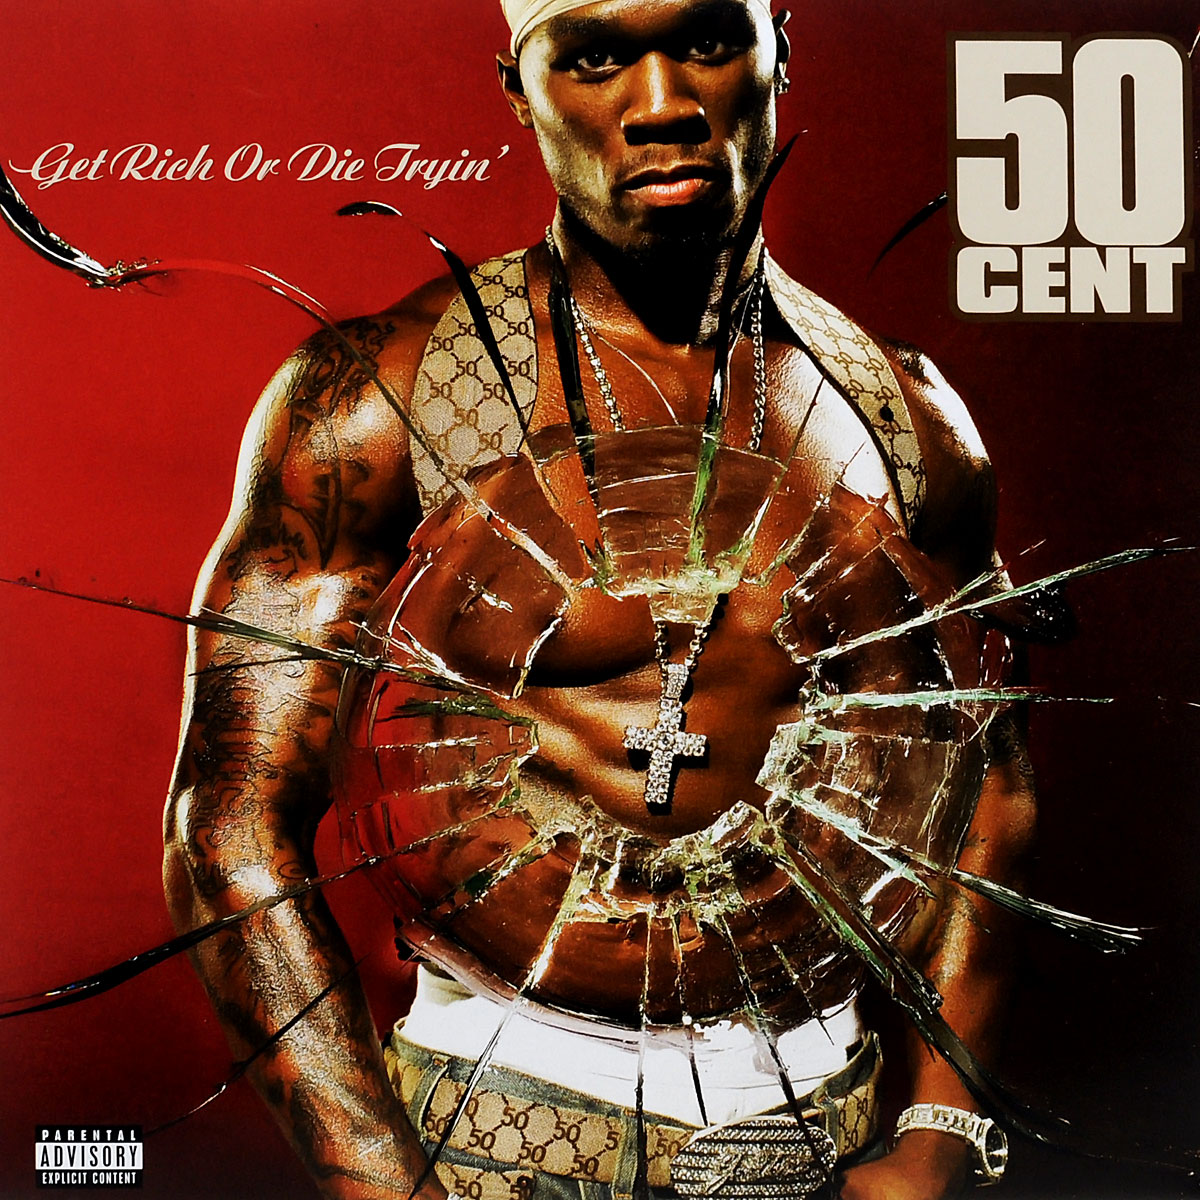 50 Cent 50 Cent. Get Rich Or Die Tryin' (2 LP)